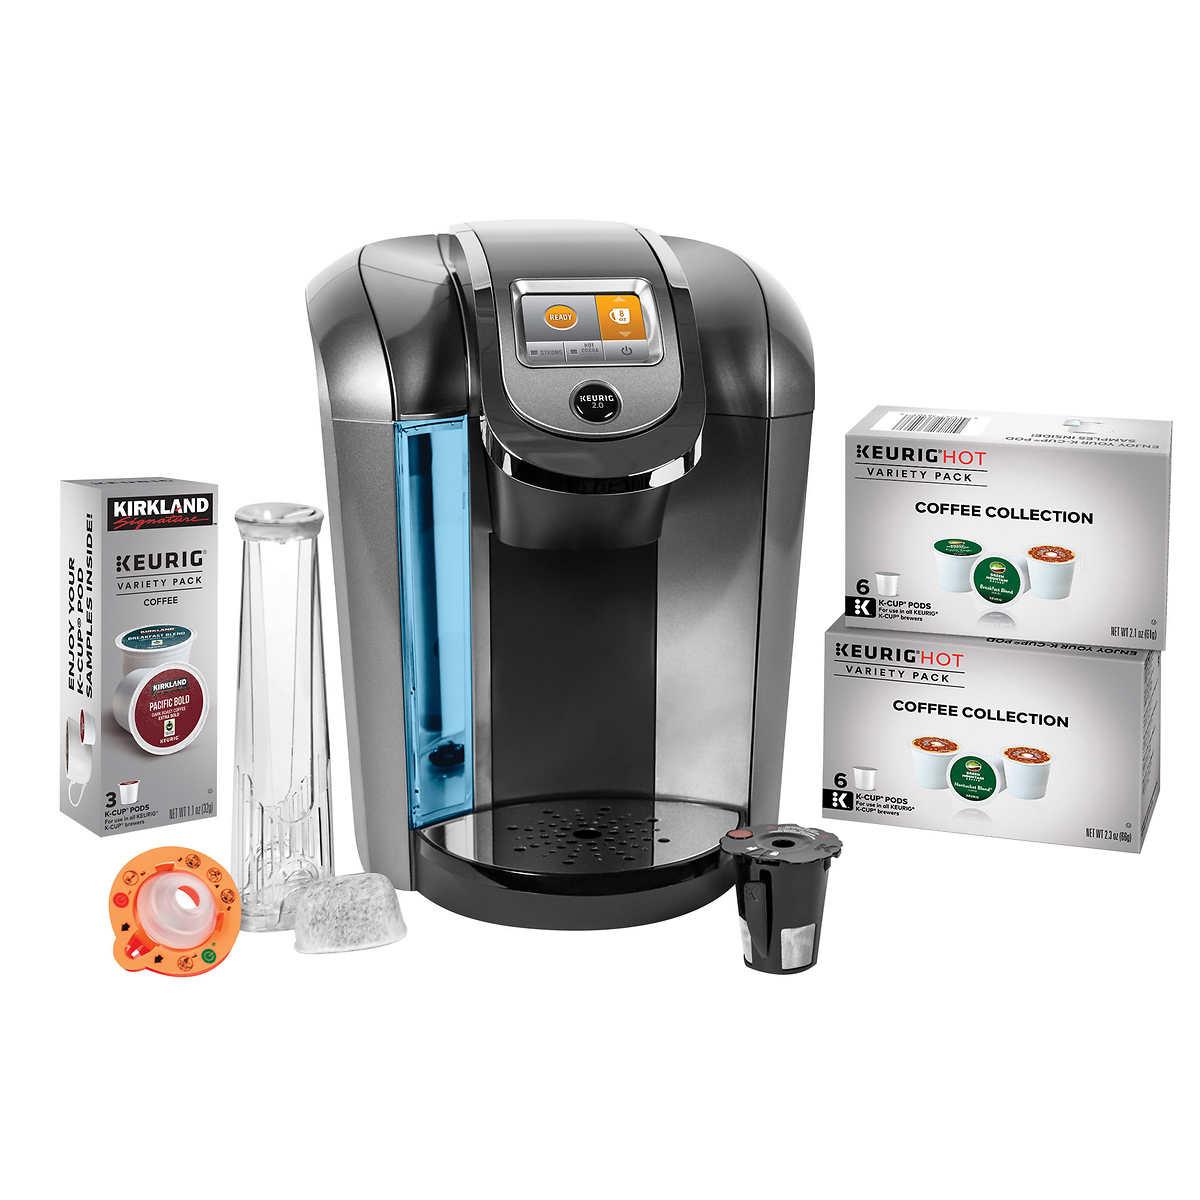 Keurig k525c single serve coffee maker 15 k cup pods and for Keurig coffee maker